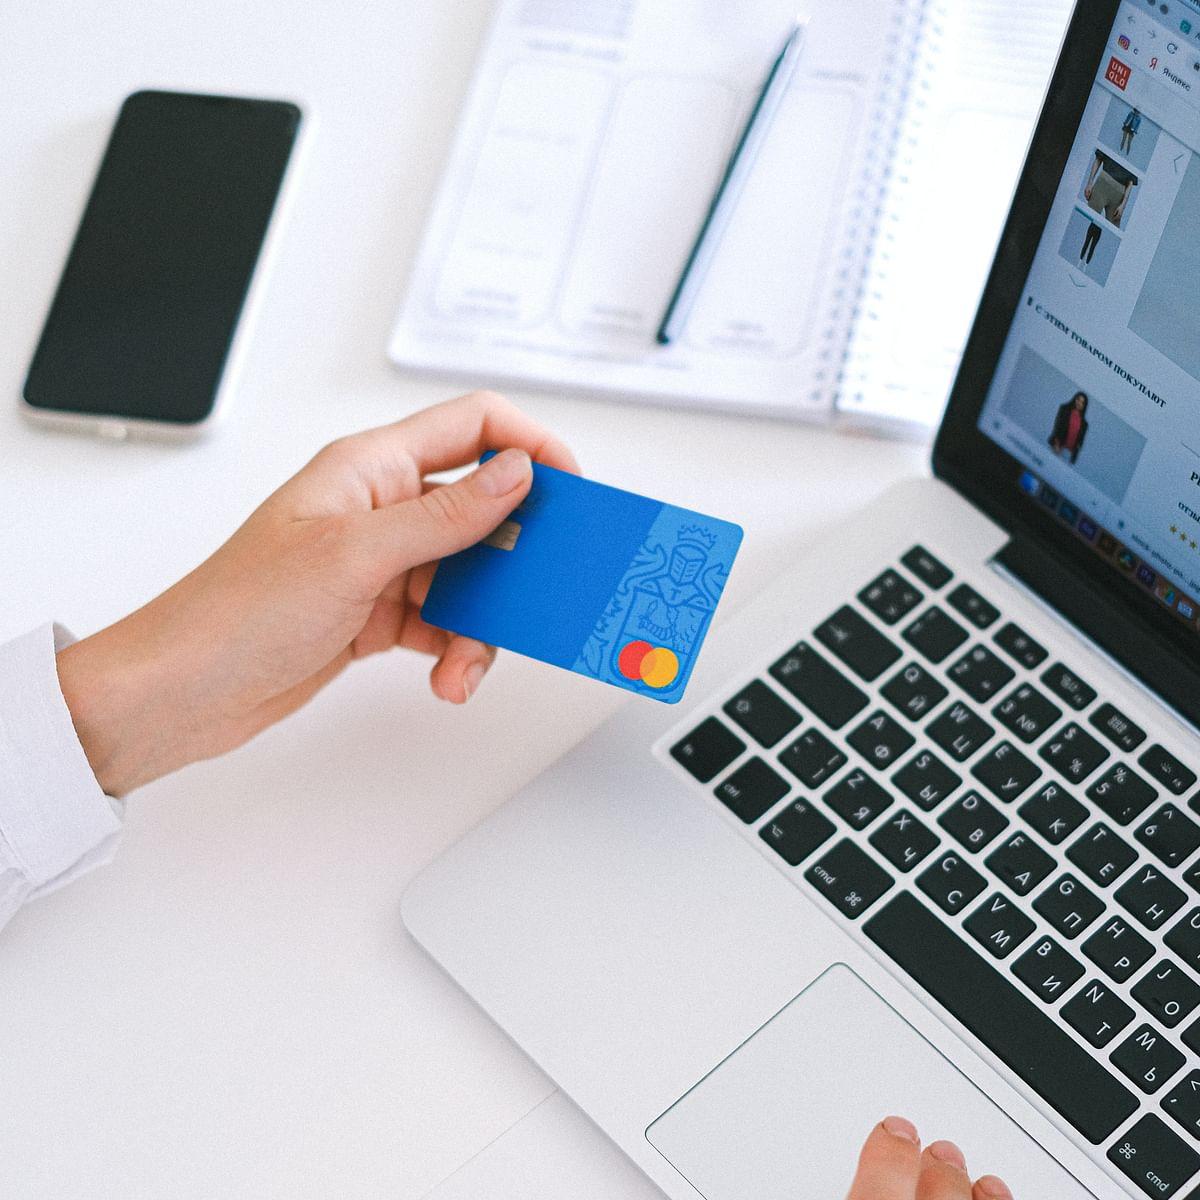 Madhya Pradesh: DISCOM thrust on online bill payment